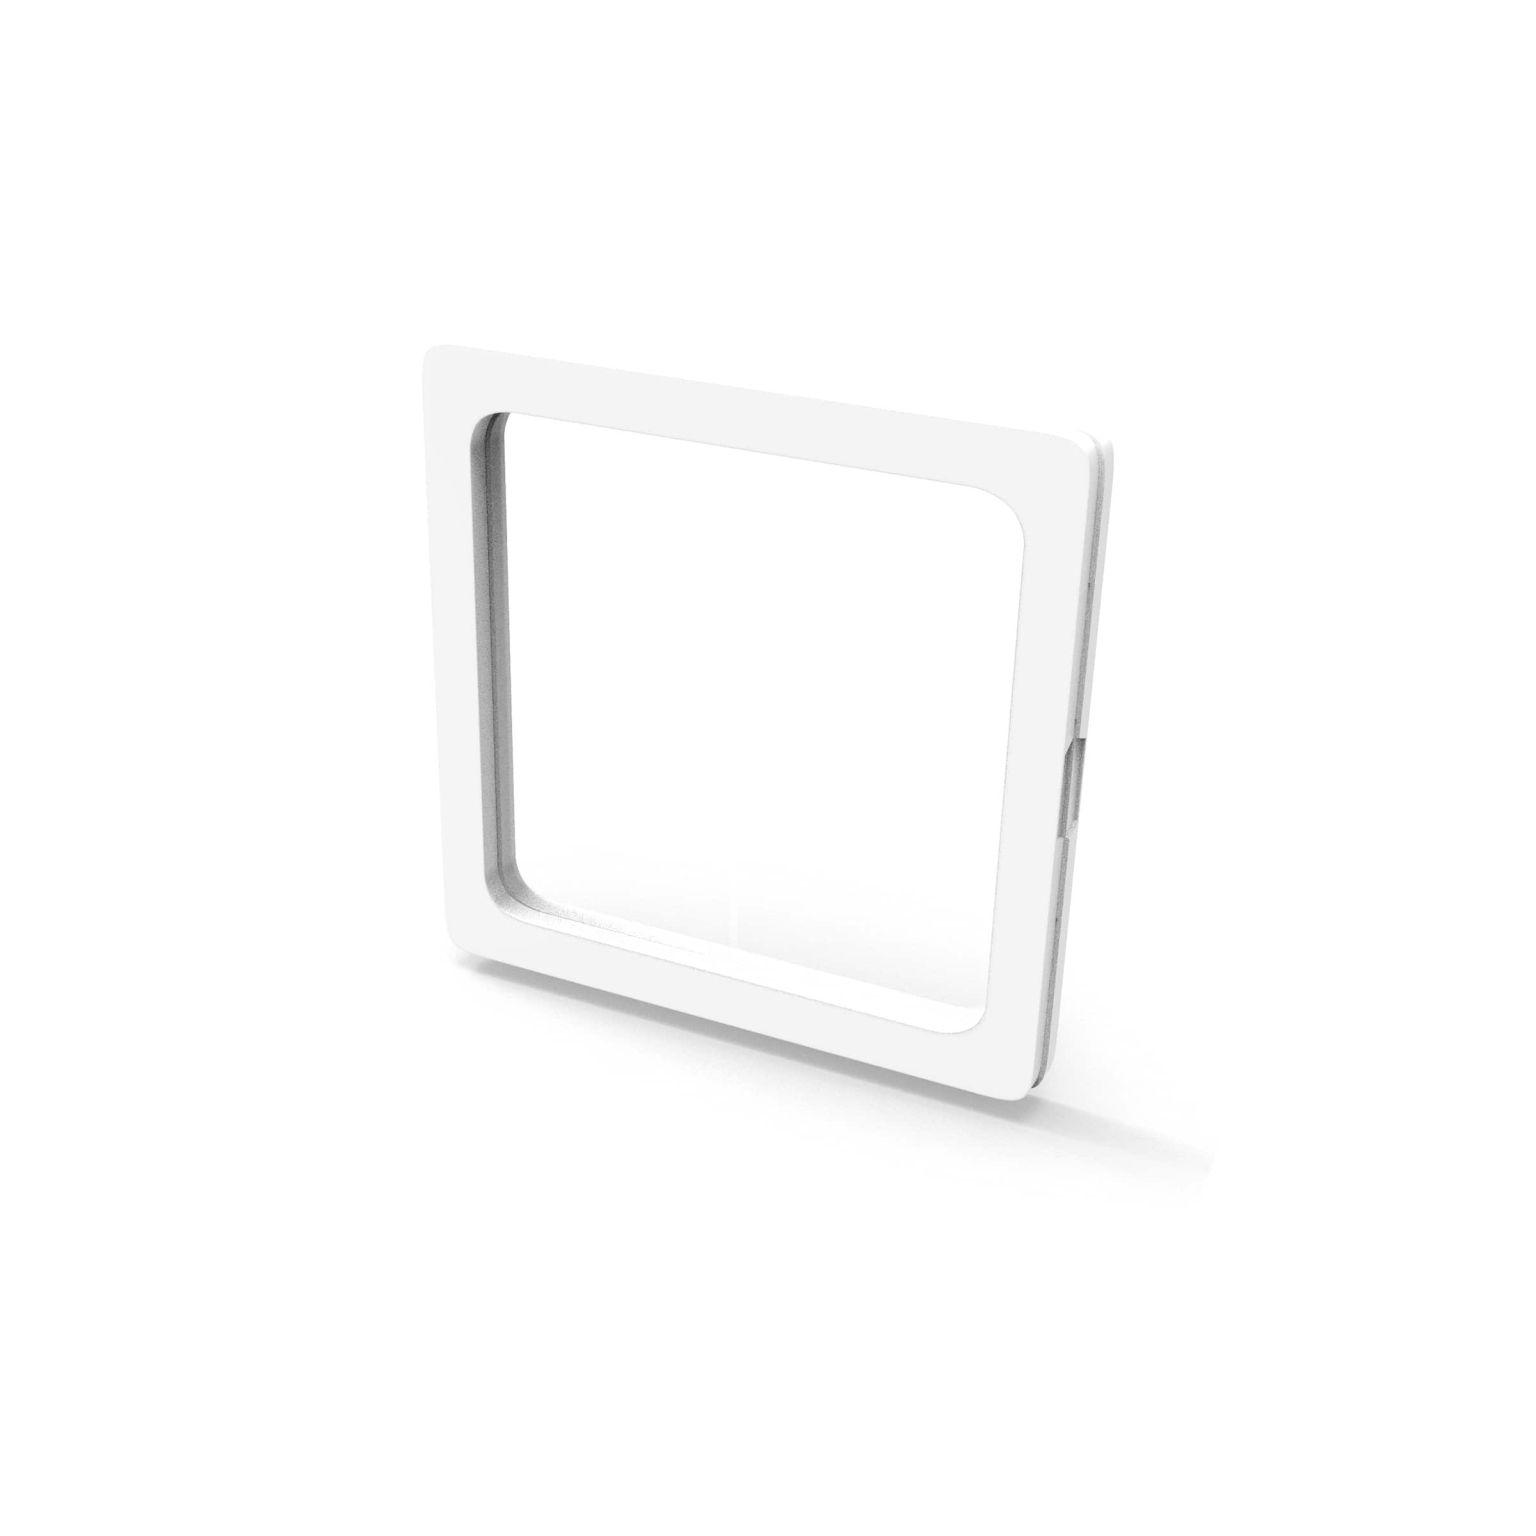 Gift Box Frame 17 x 17 x 2 cm Blanc